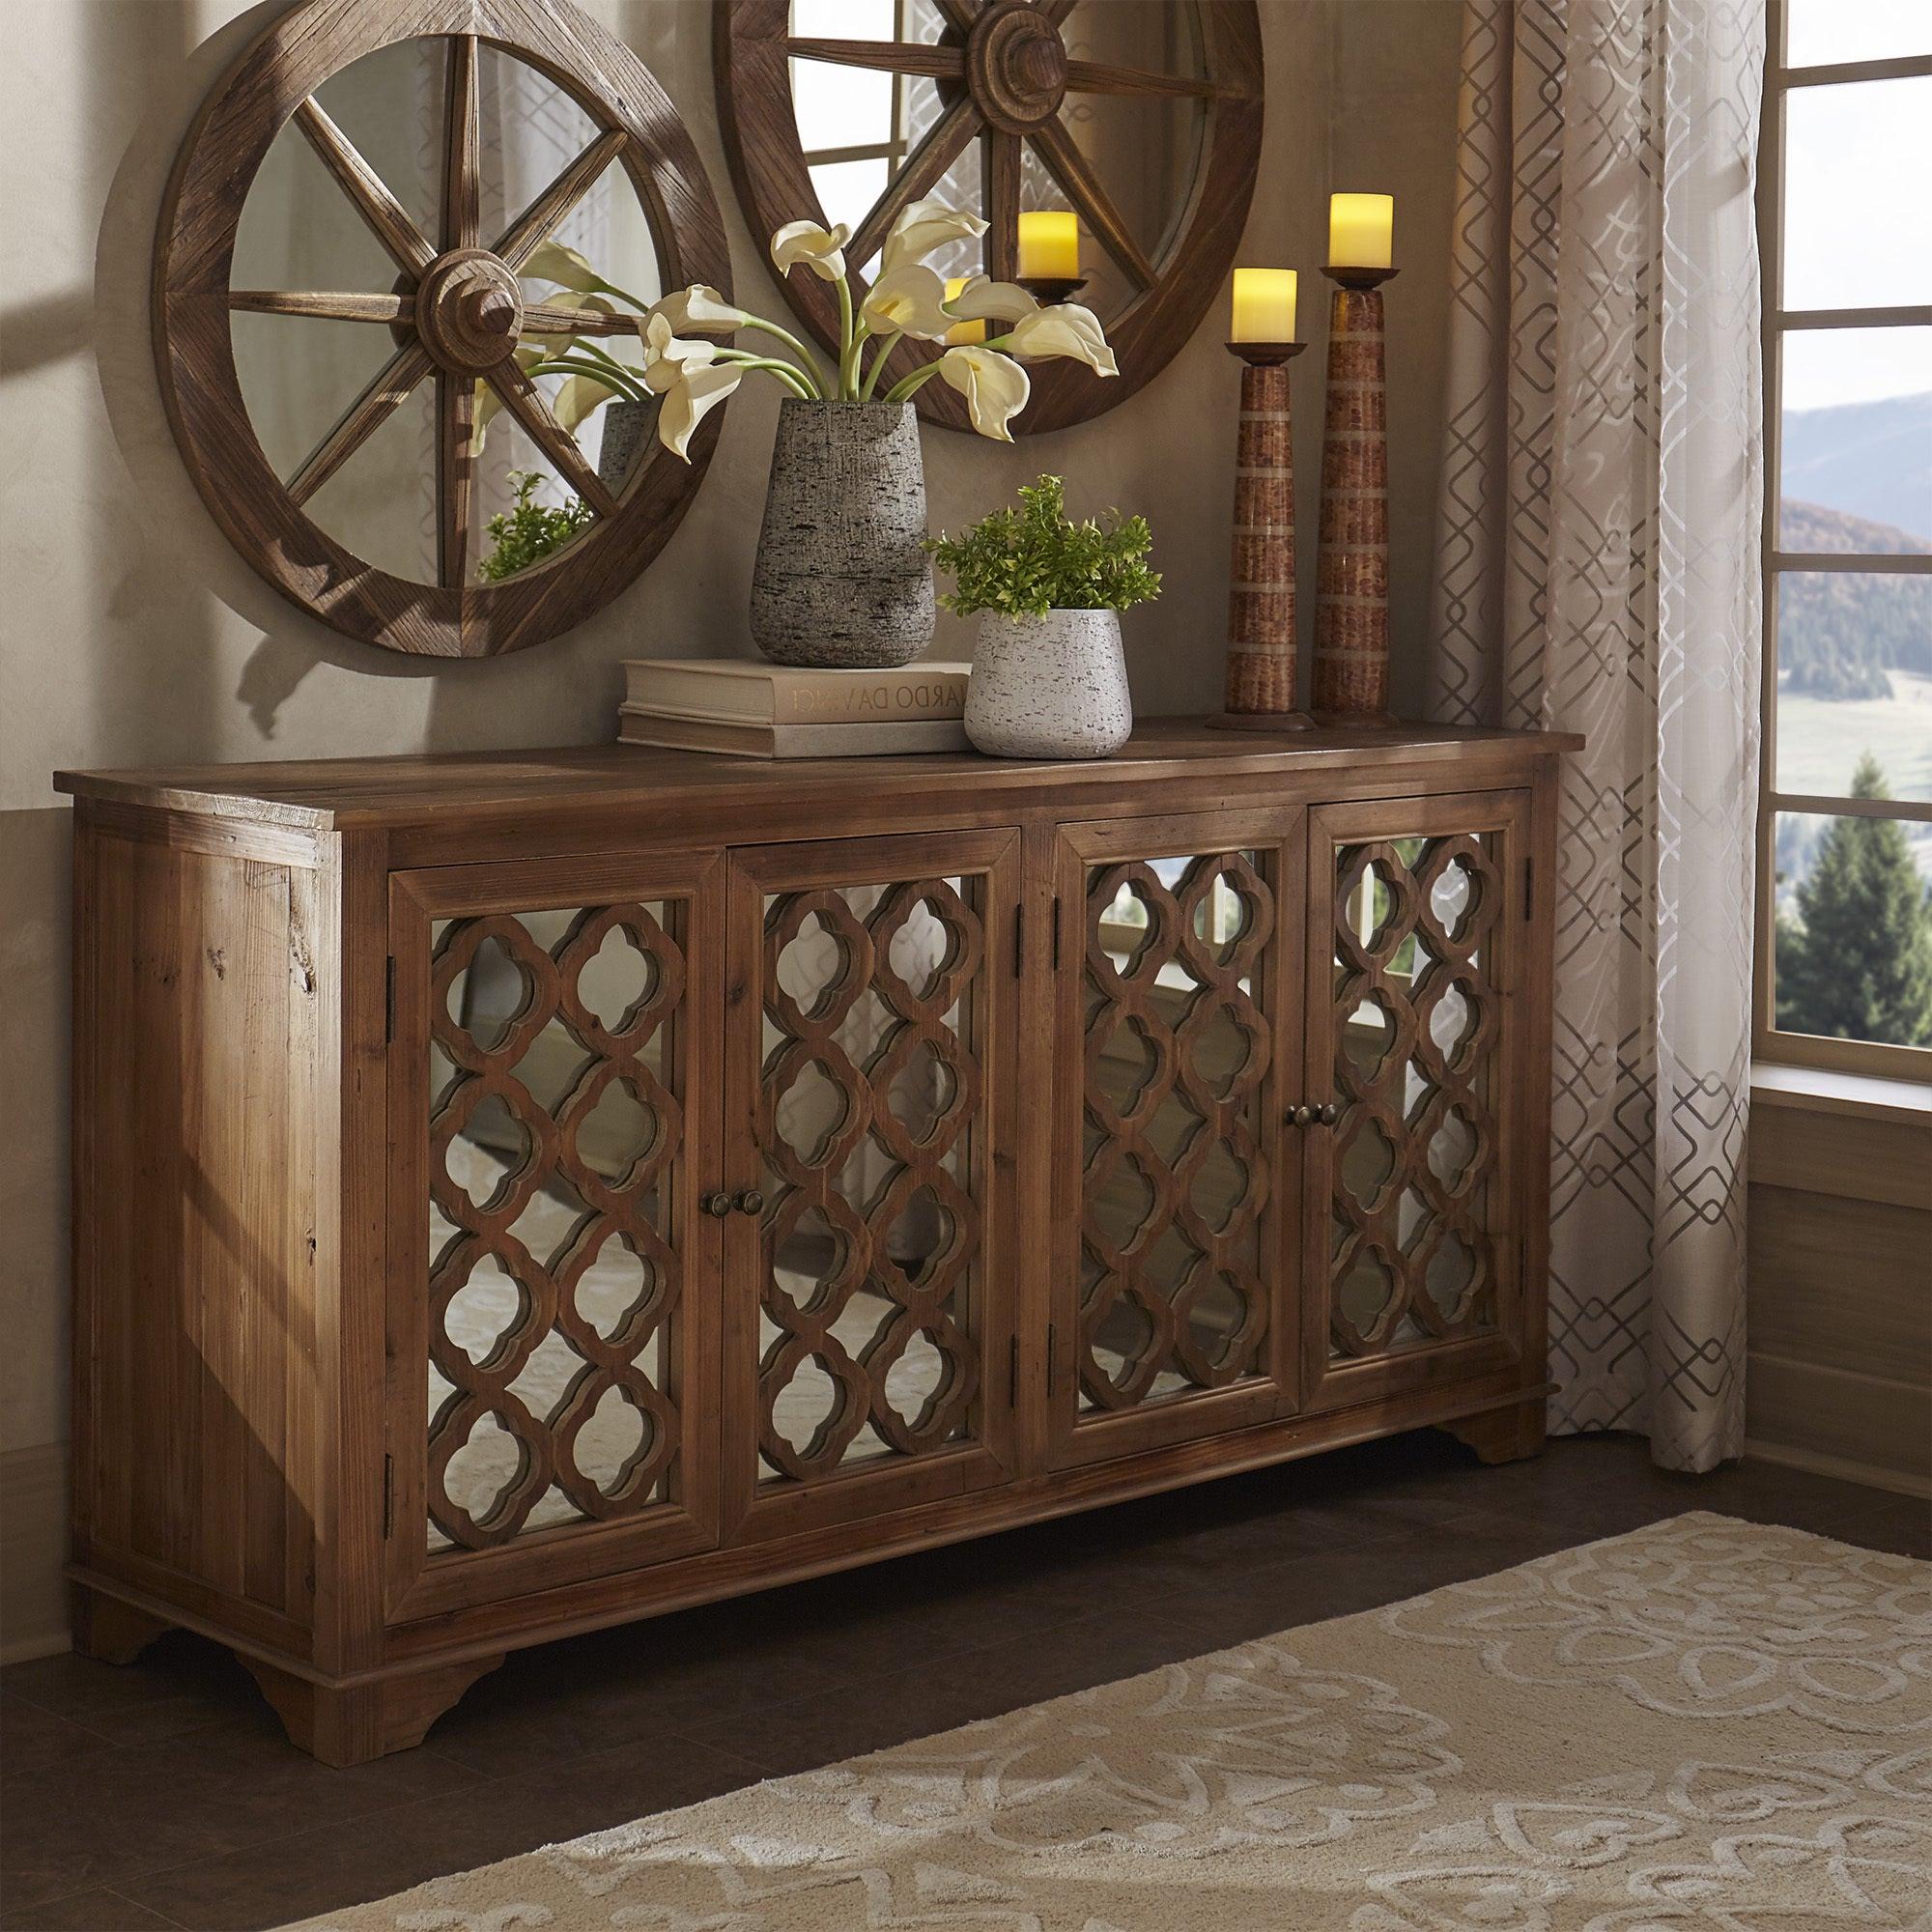 Hamptons Quatrefoil Reclaimed Wood Mirrored Buffet Sideboard Cabinet Inspire Q Artisan Inside Mirrored Double Door Buffets (View 8 of 20)